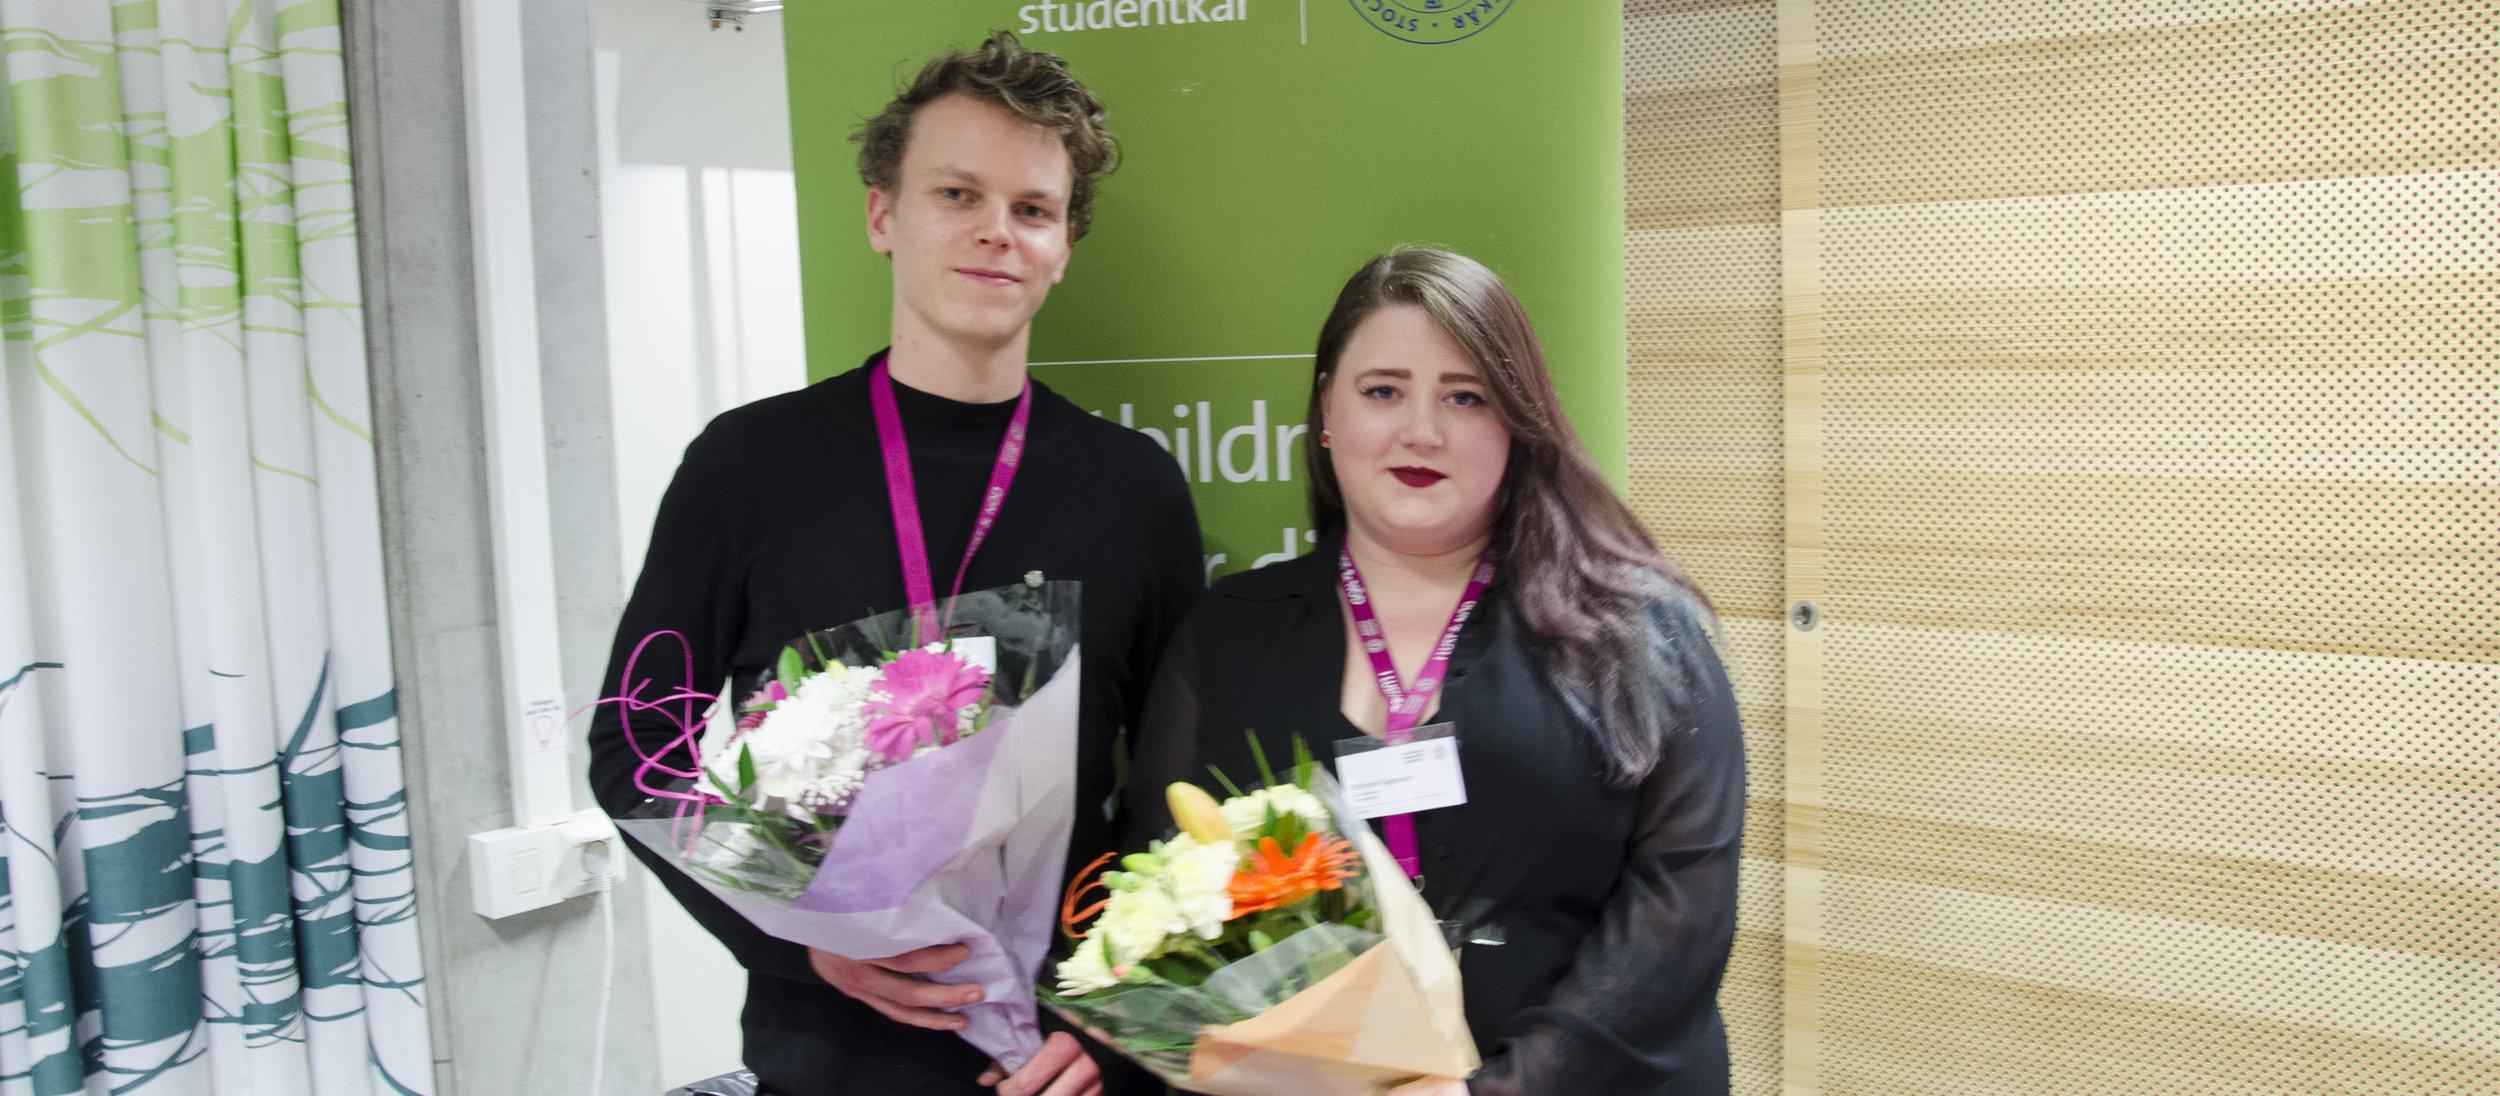 Presidiet: Henric Södergren och Stefanie Tagesson